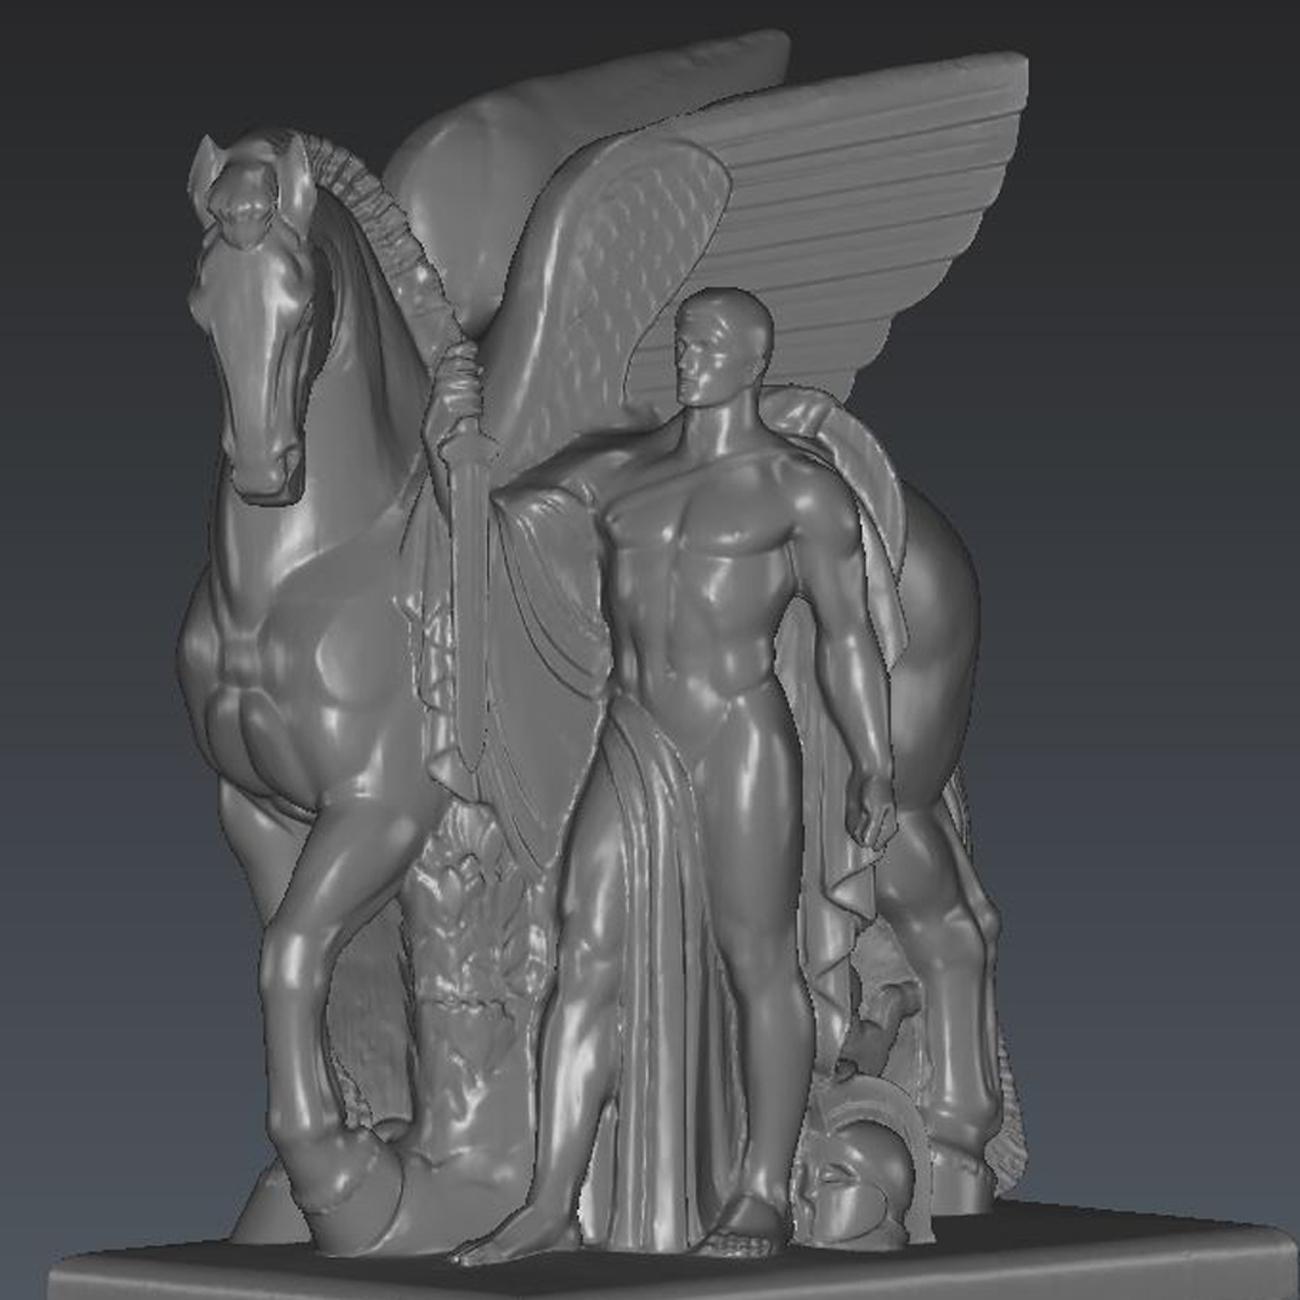 Soldiers Memorial Museum - TWM, Inc.